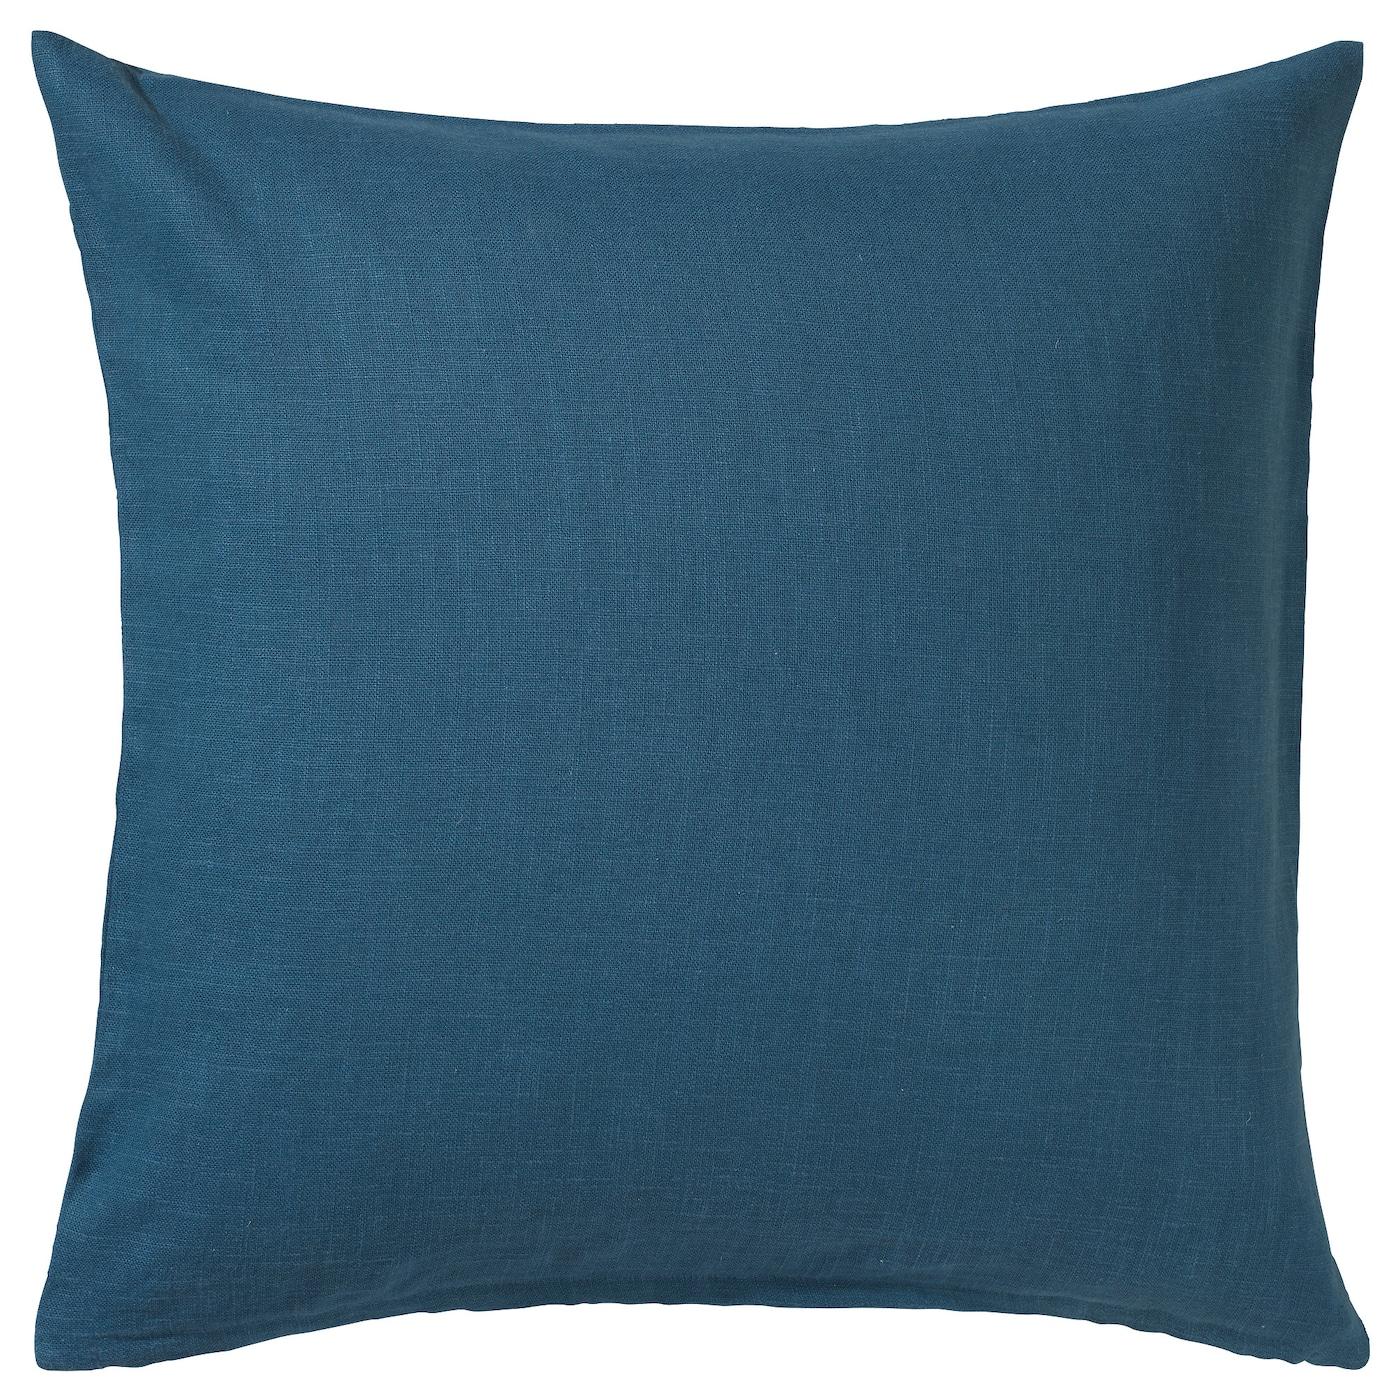 valby ruta tapis poils ras multicolore 133 x 195 cm ikea. Black Bedroom Furniture Sets. Home Design Ideas